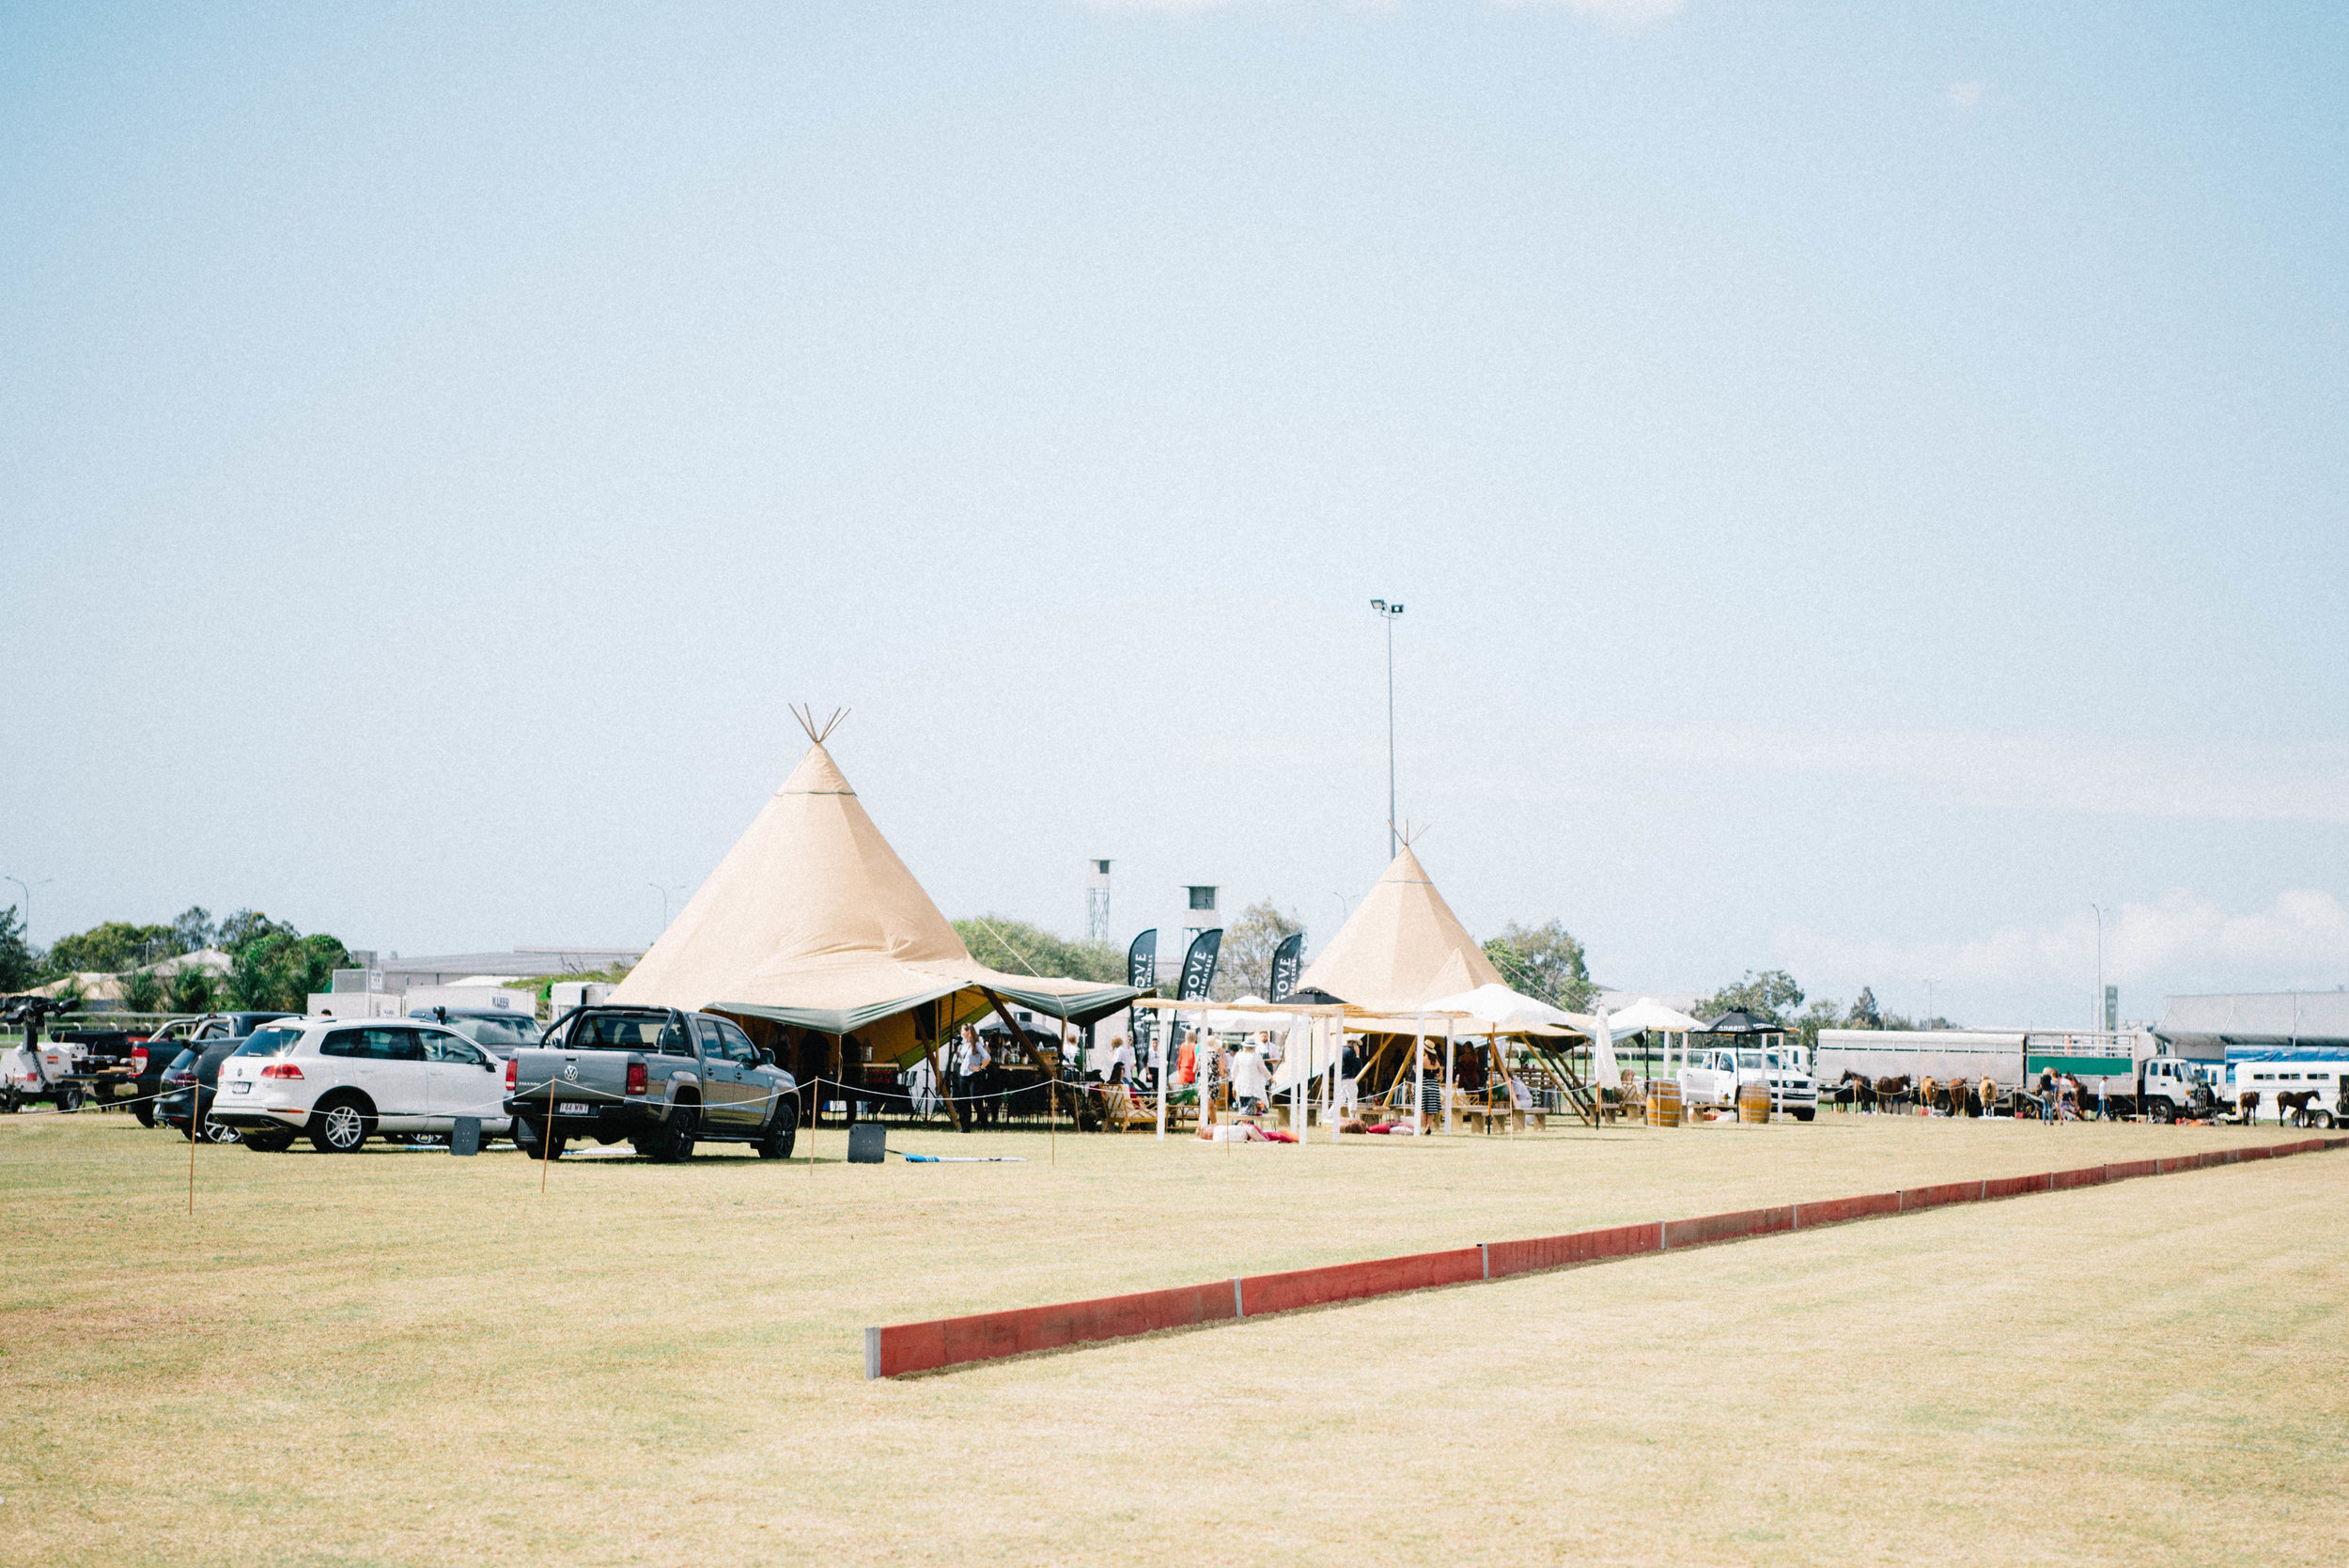 Hampton Event Hire | Brisbane Event Styling | www.hamptoneventhire.com | Polo Los Loosa, Doomben Racecourse